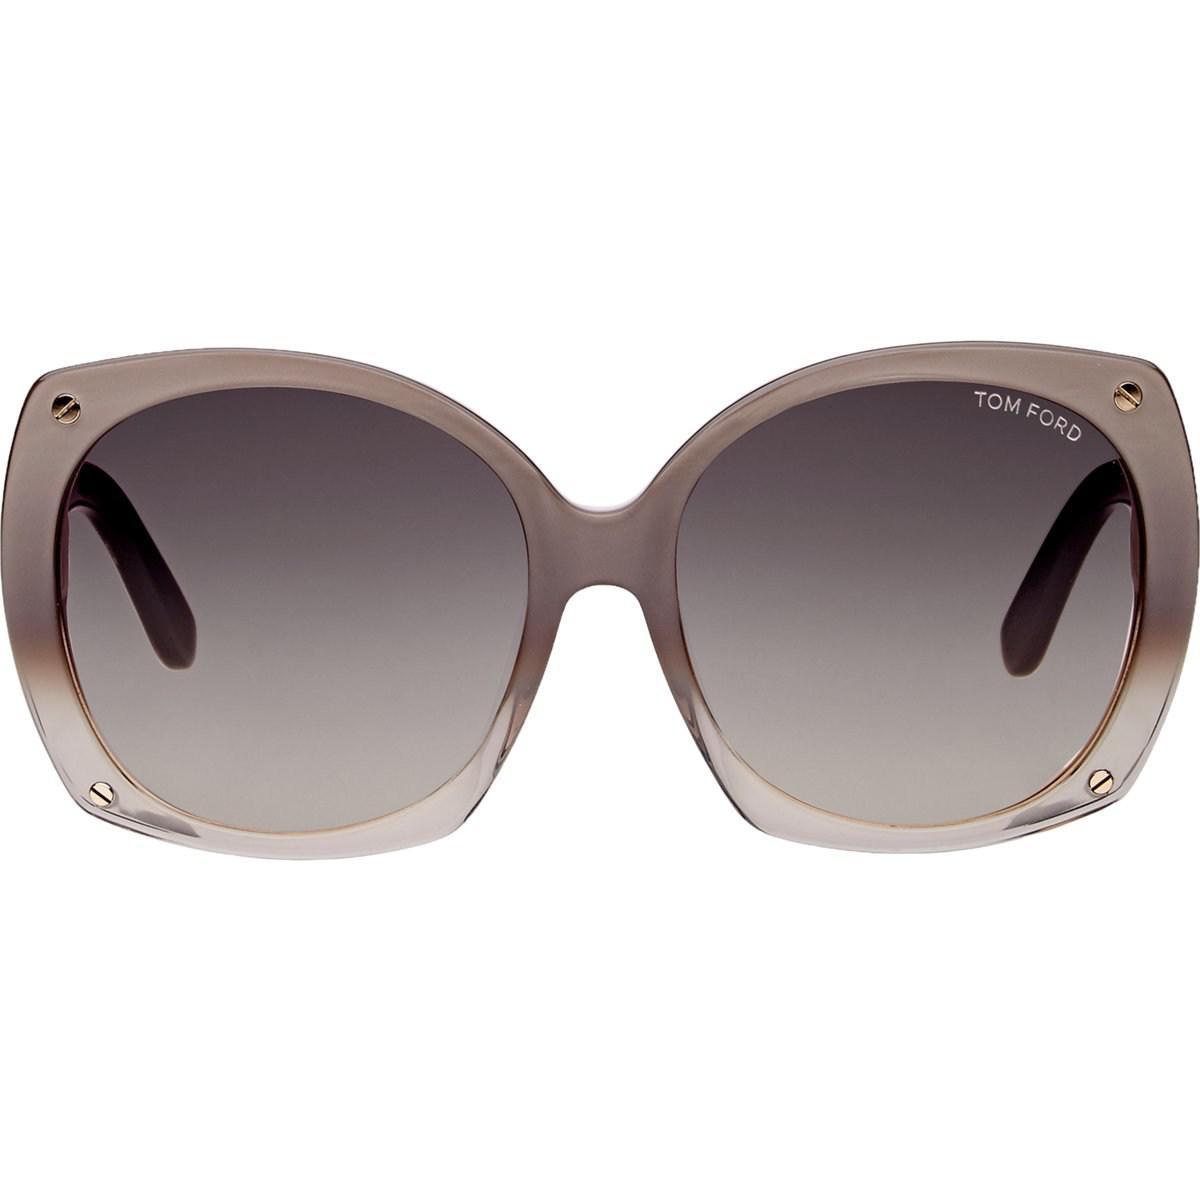 68889ba0d37d Lyst - Tom Ford Gabriella Sunglasses in Gray